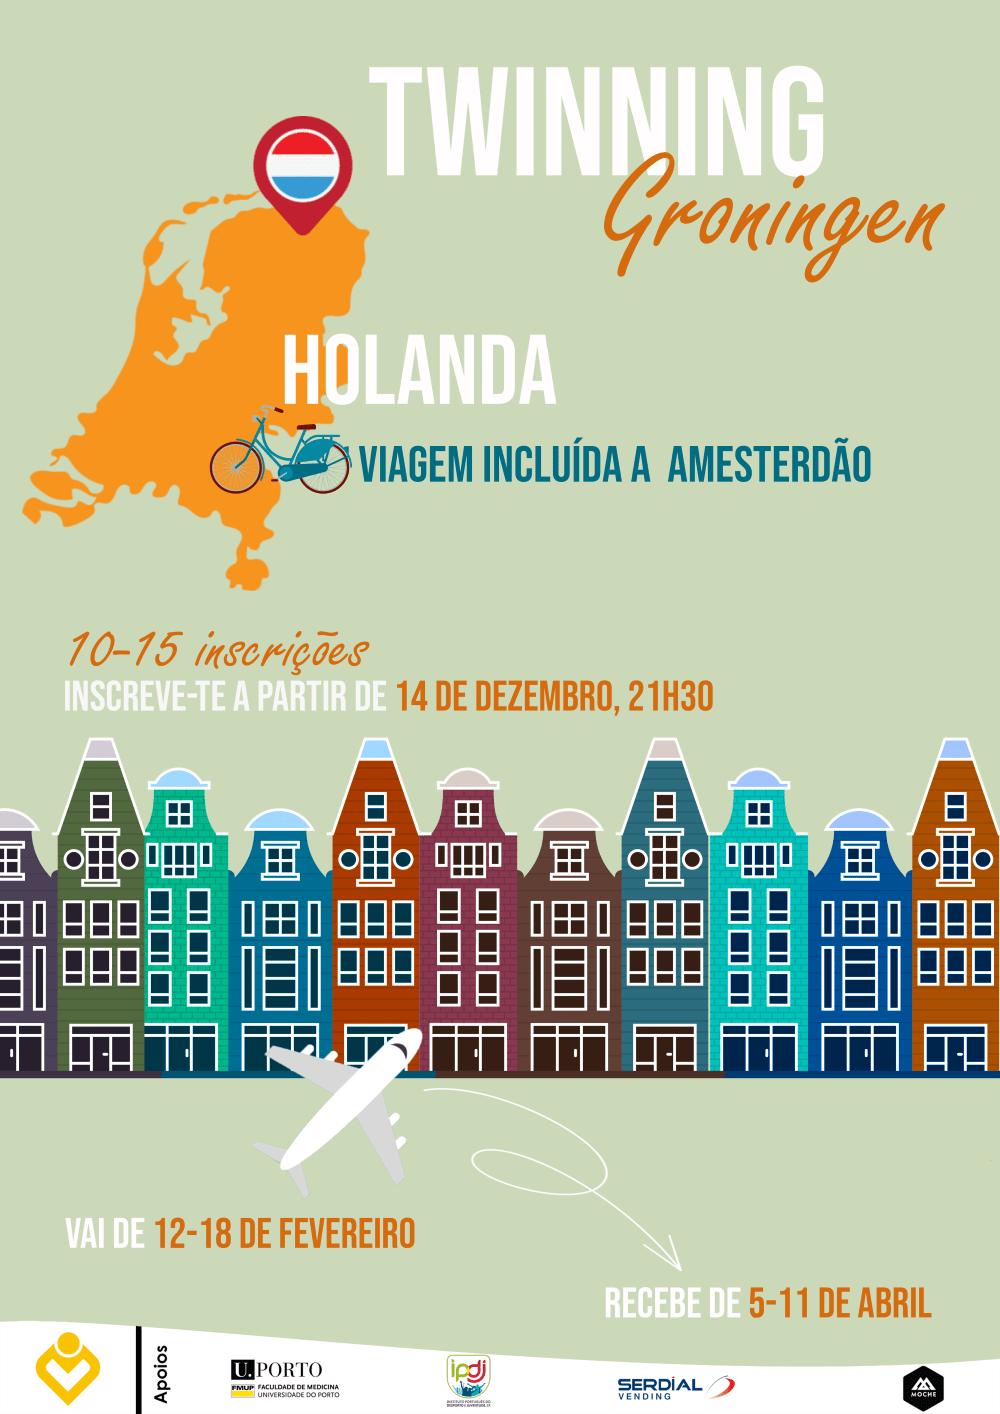 Twinning Groningen